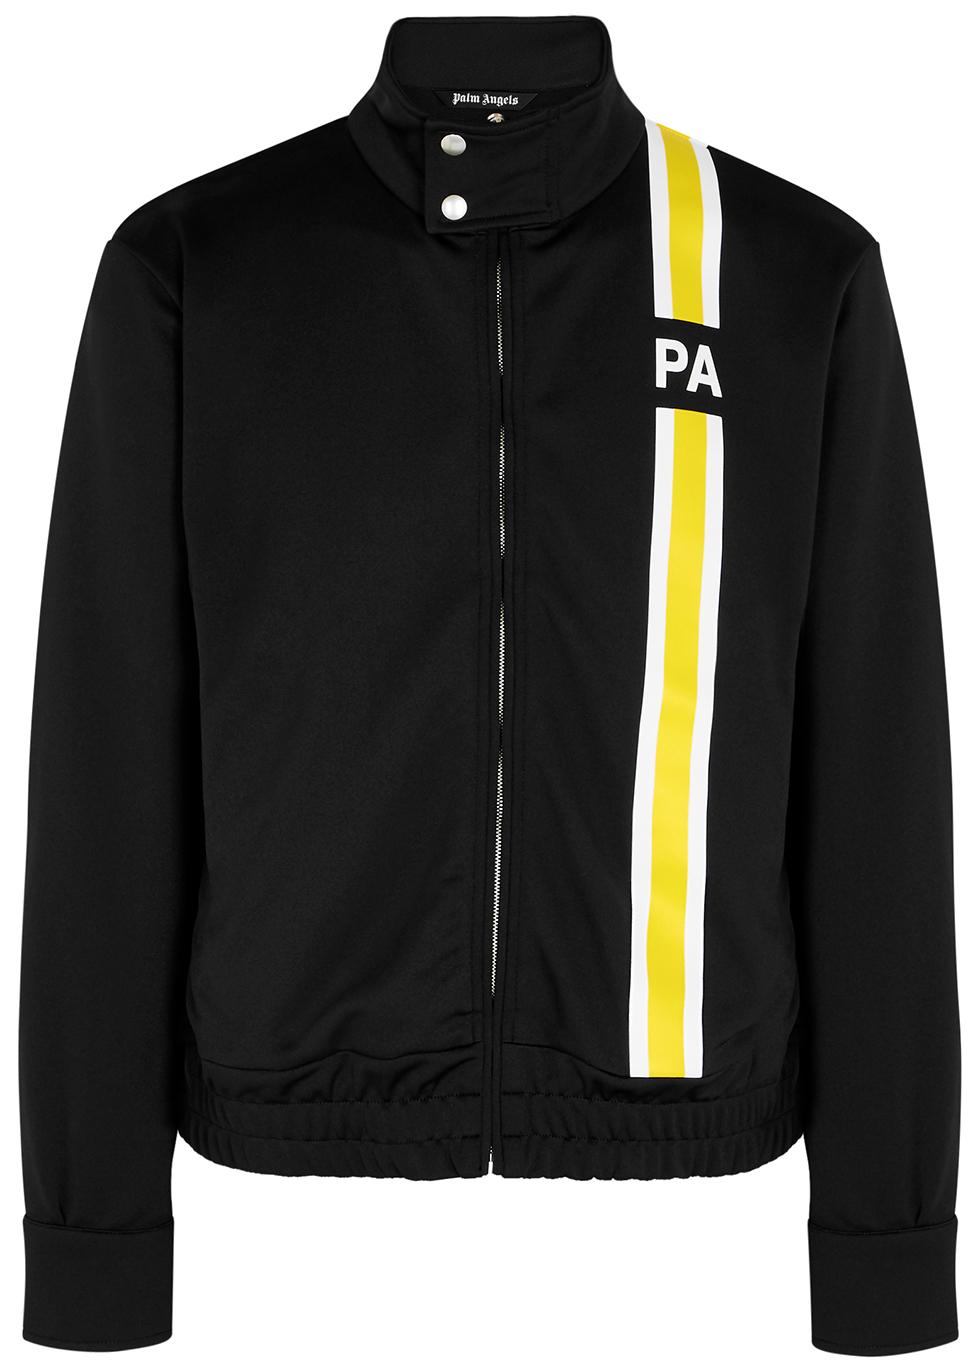 Black striped jersey track jacket